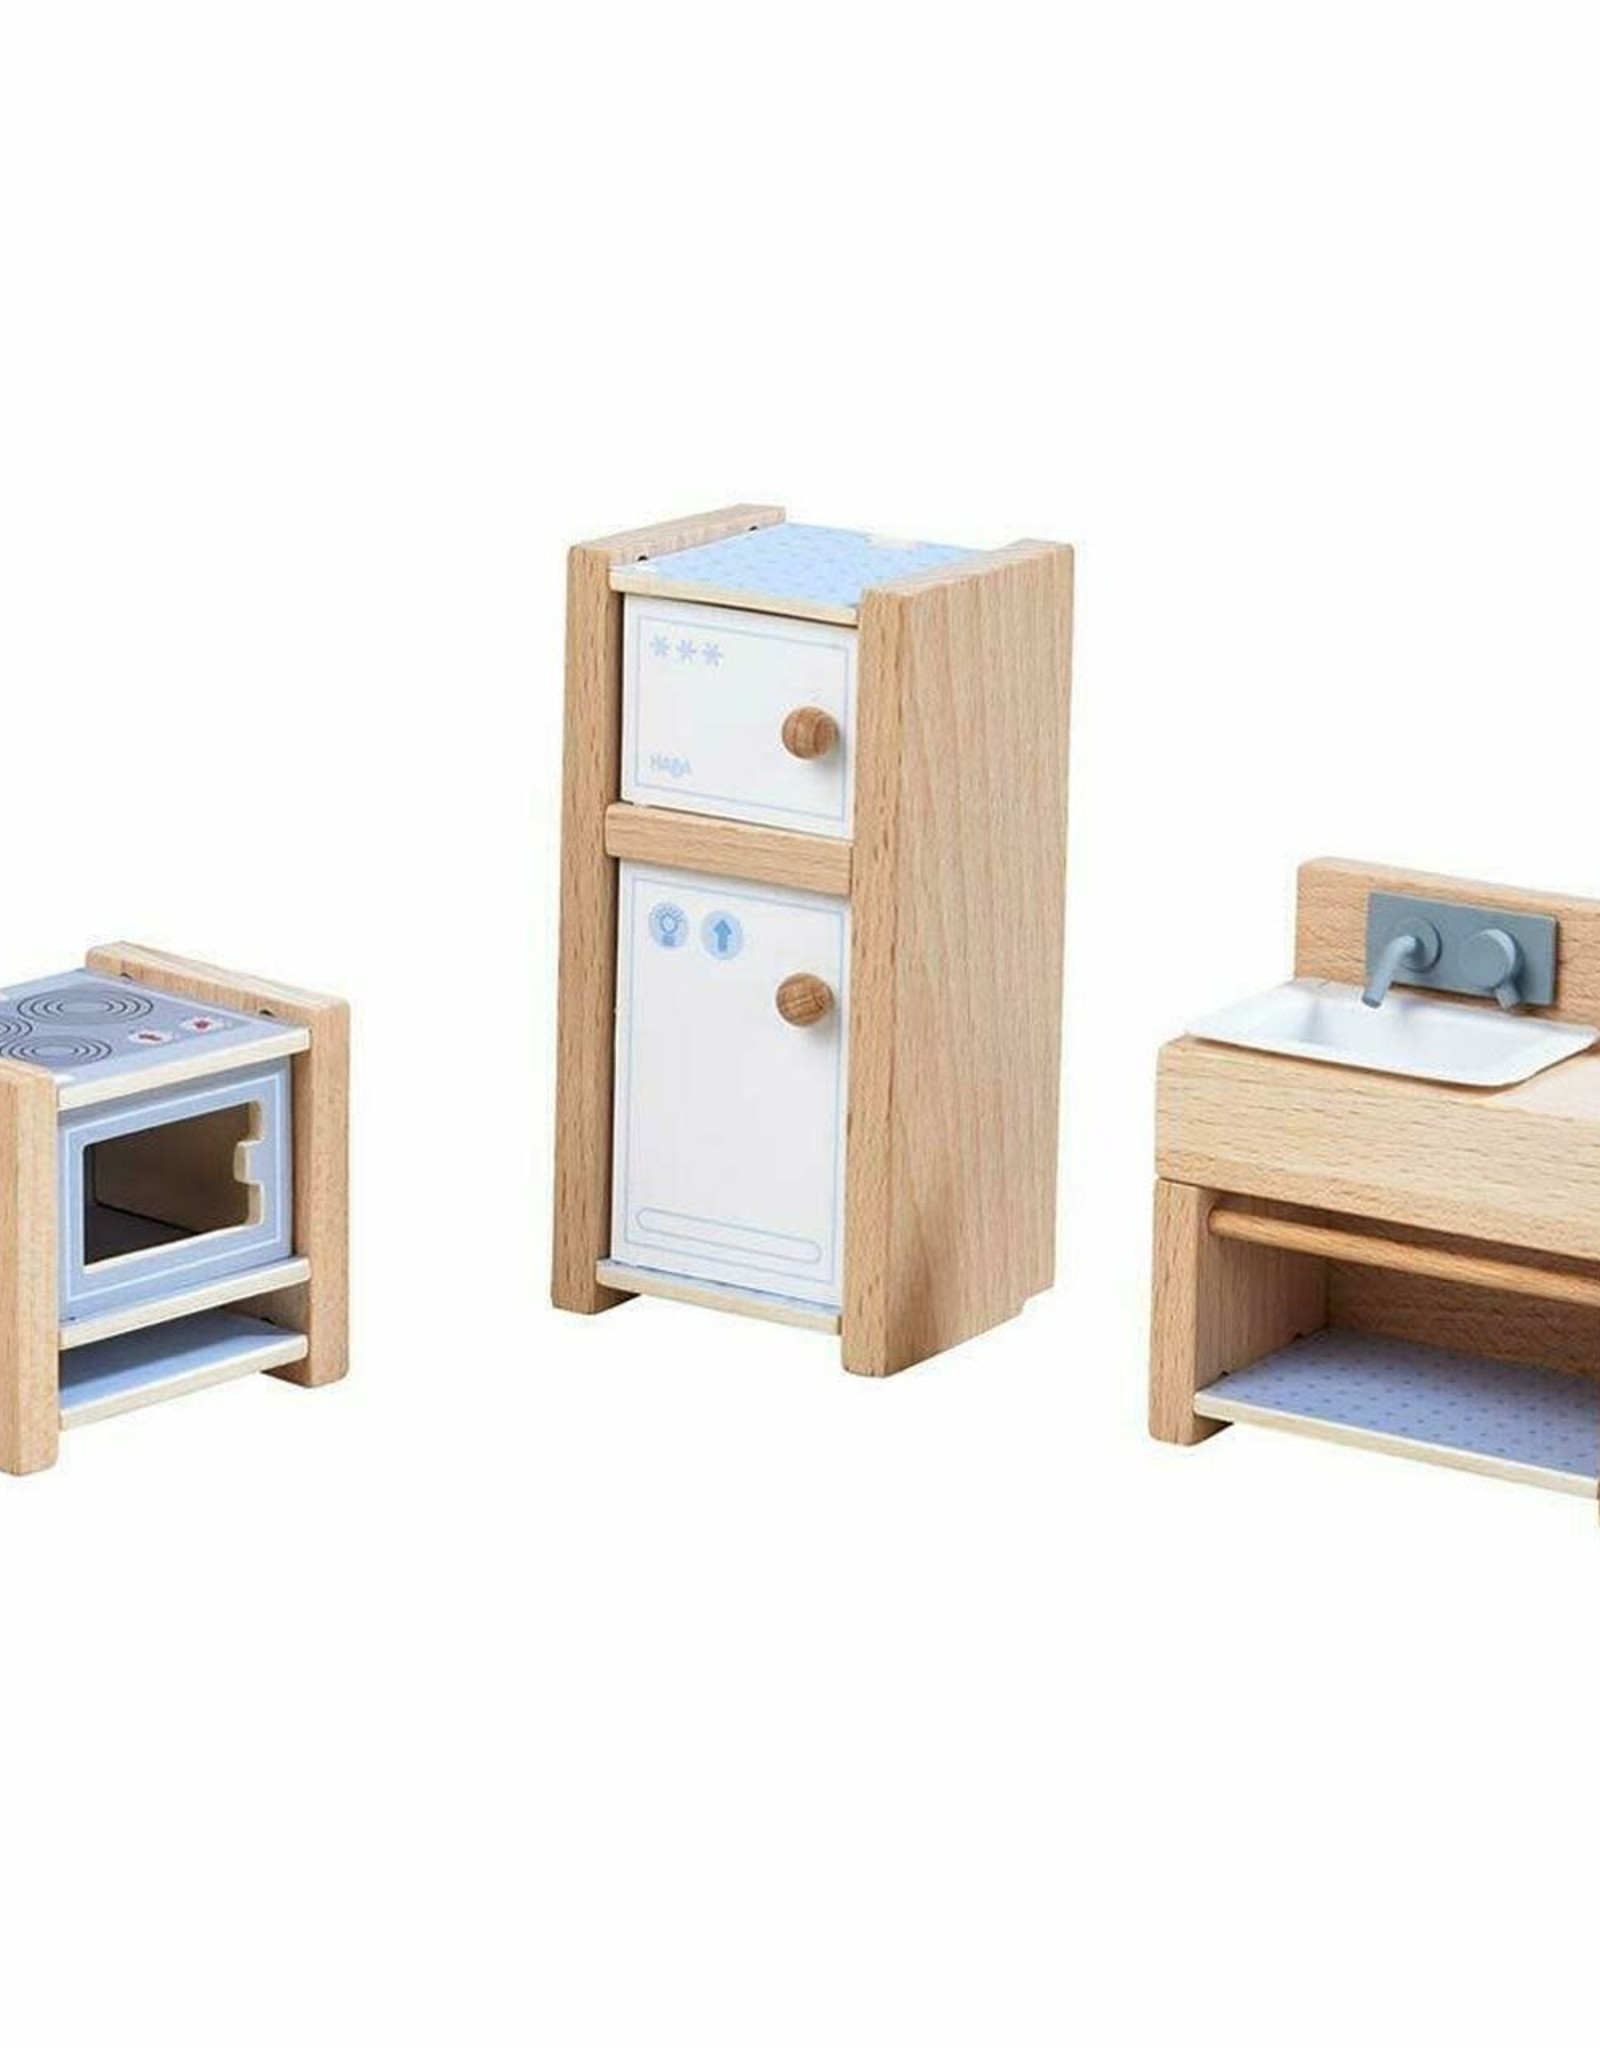 Haba LF Kitchen Furniture